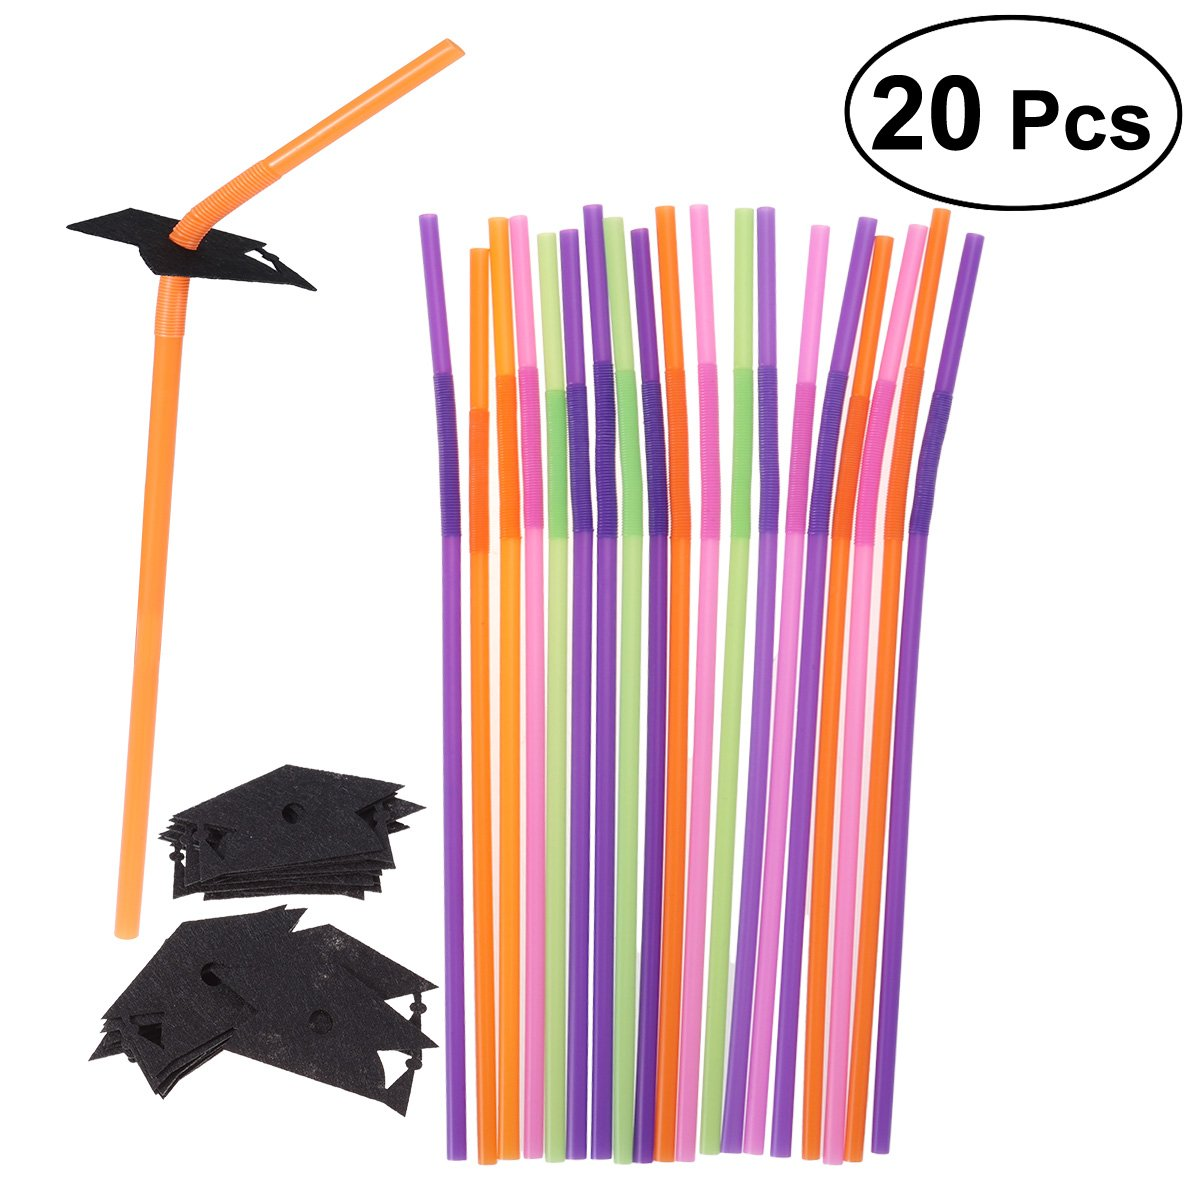 10 Pcs Dr Graduation School Party Striped cap Glitter Paper Straw Decor